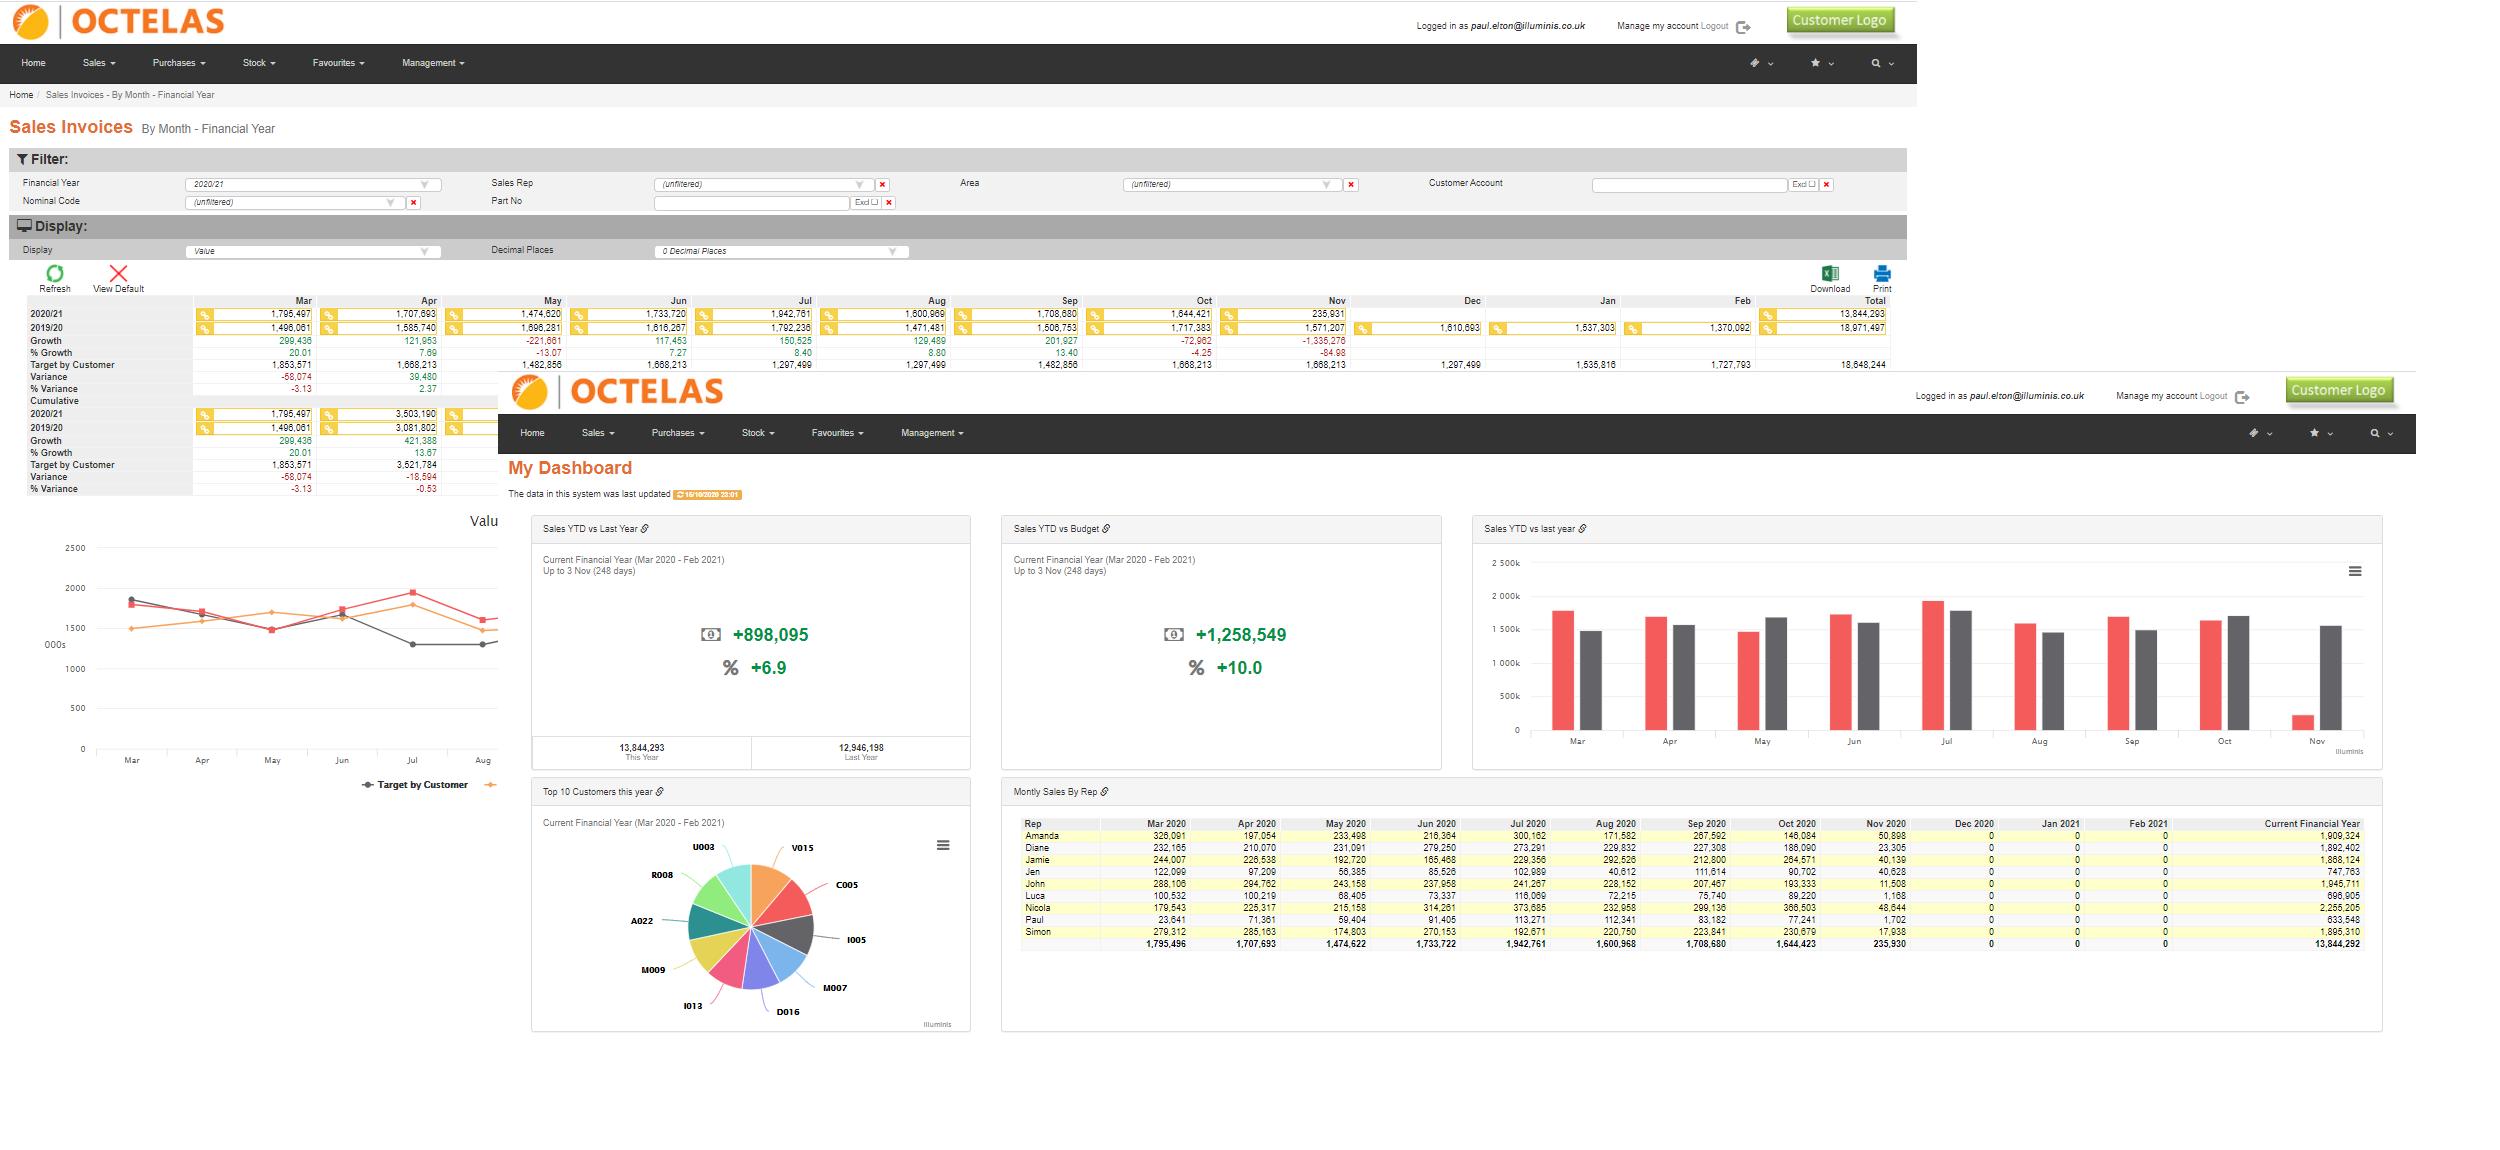 Octelas Business Reporting Software